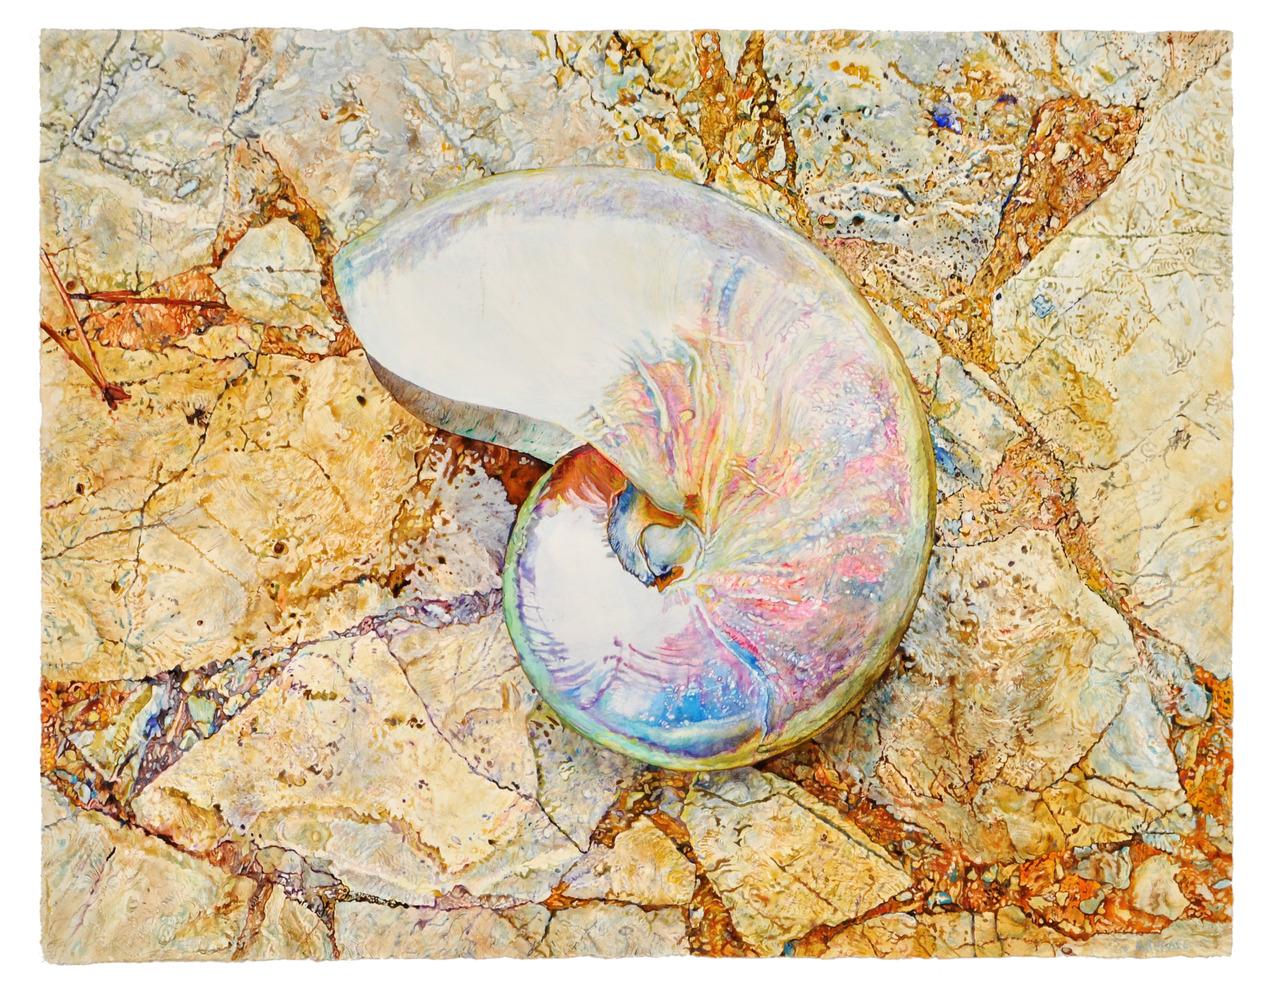 Wayfarer - watercolor on paper by Joseph Raffael